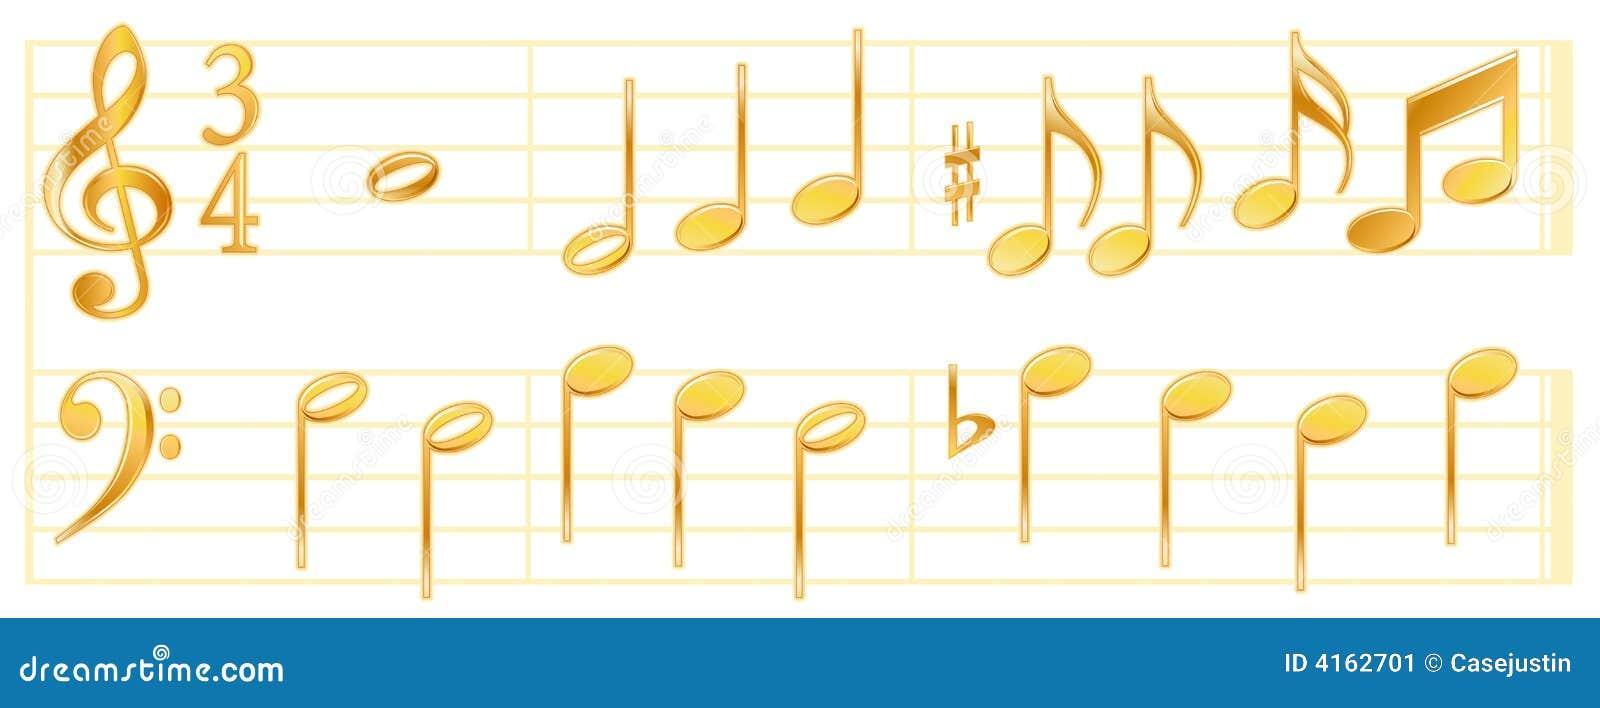 Golden Music Notes Stock Vector. Image Of Music, Metallic